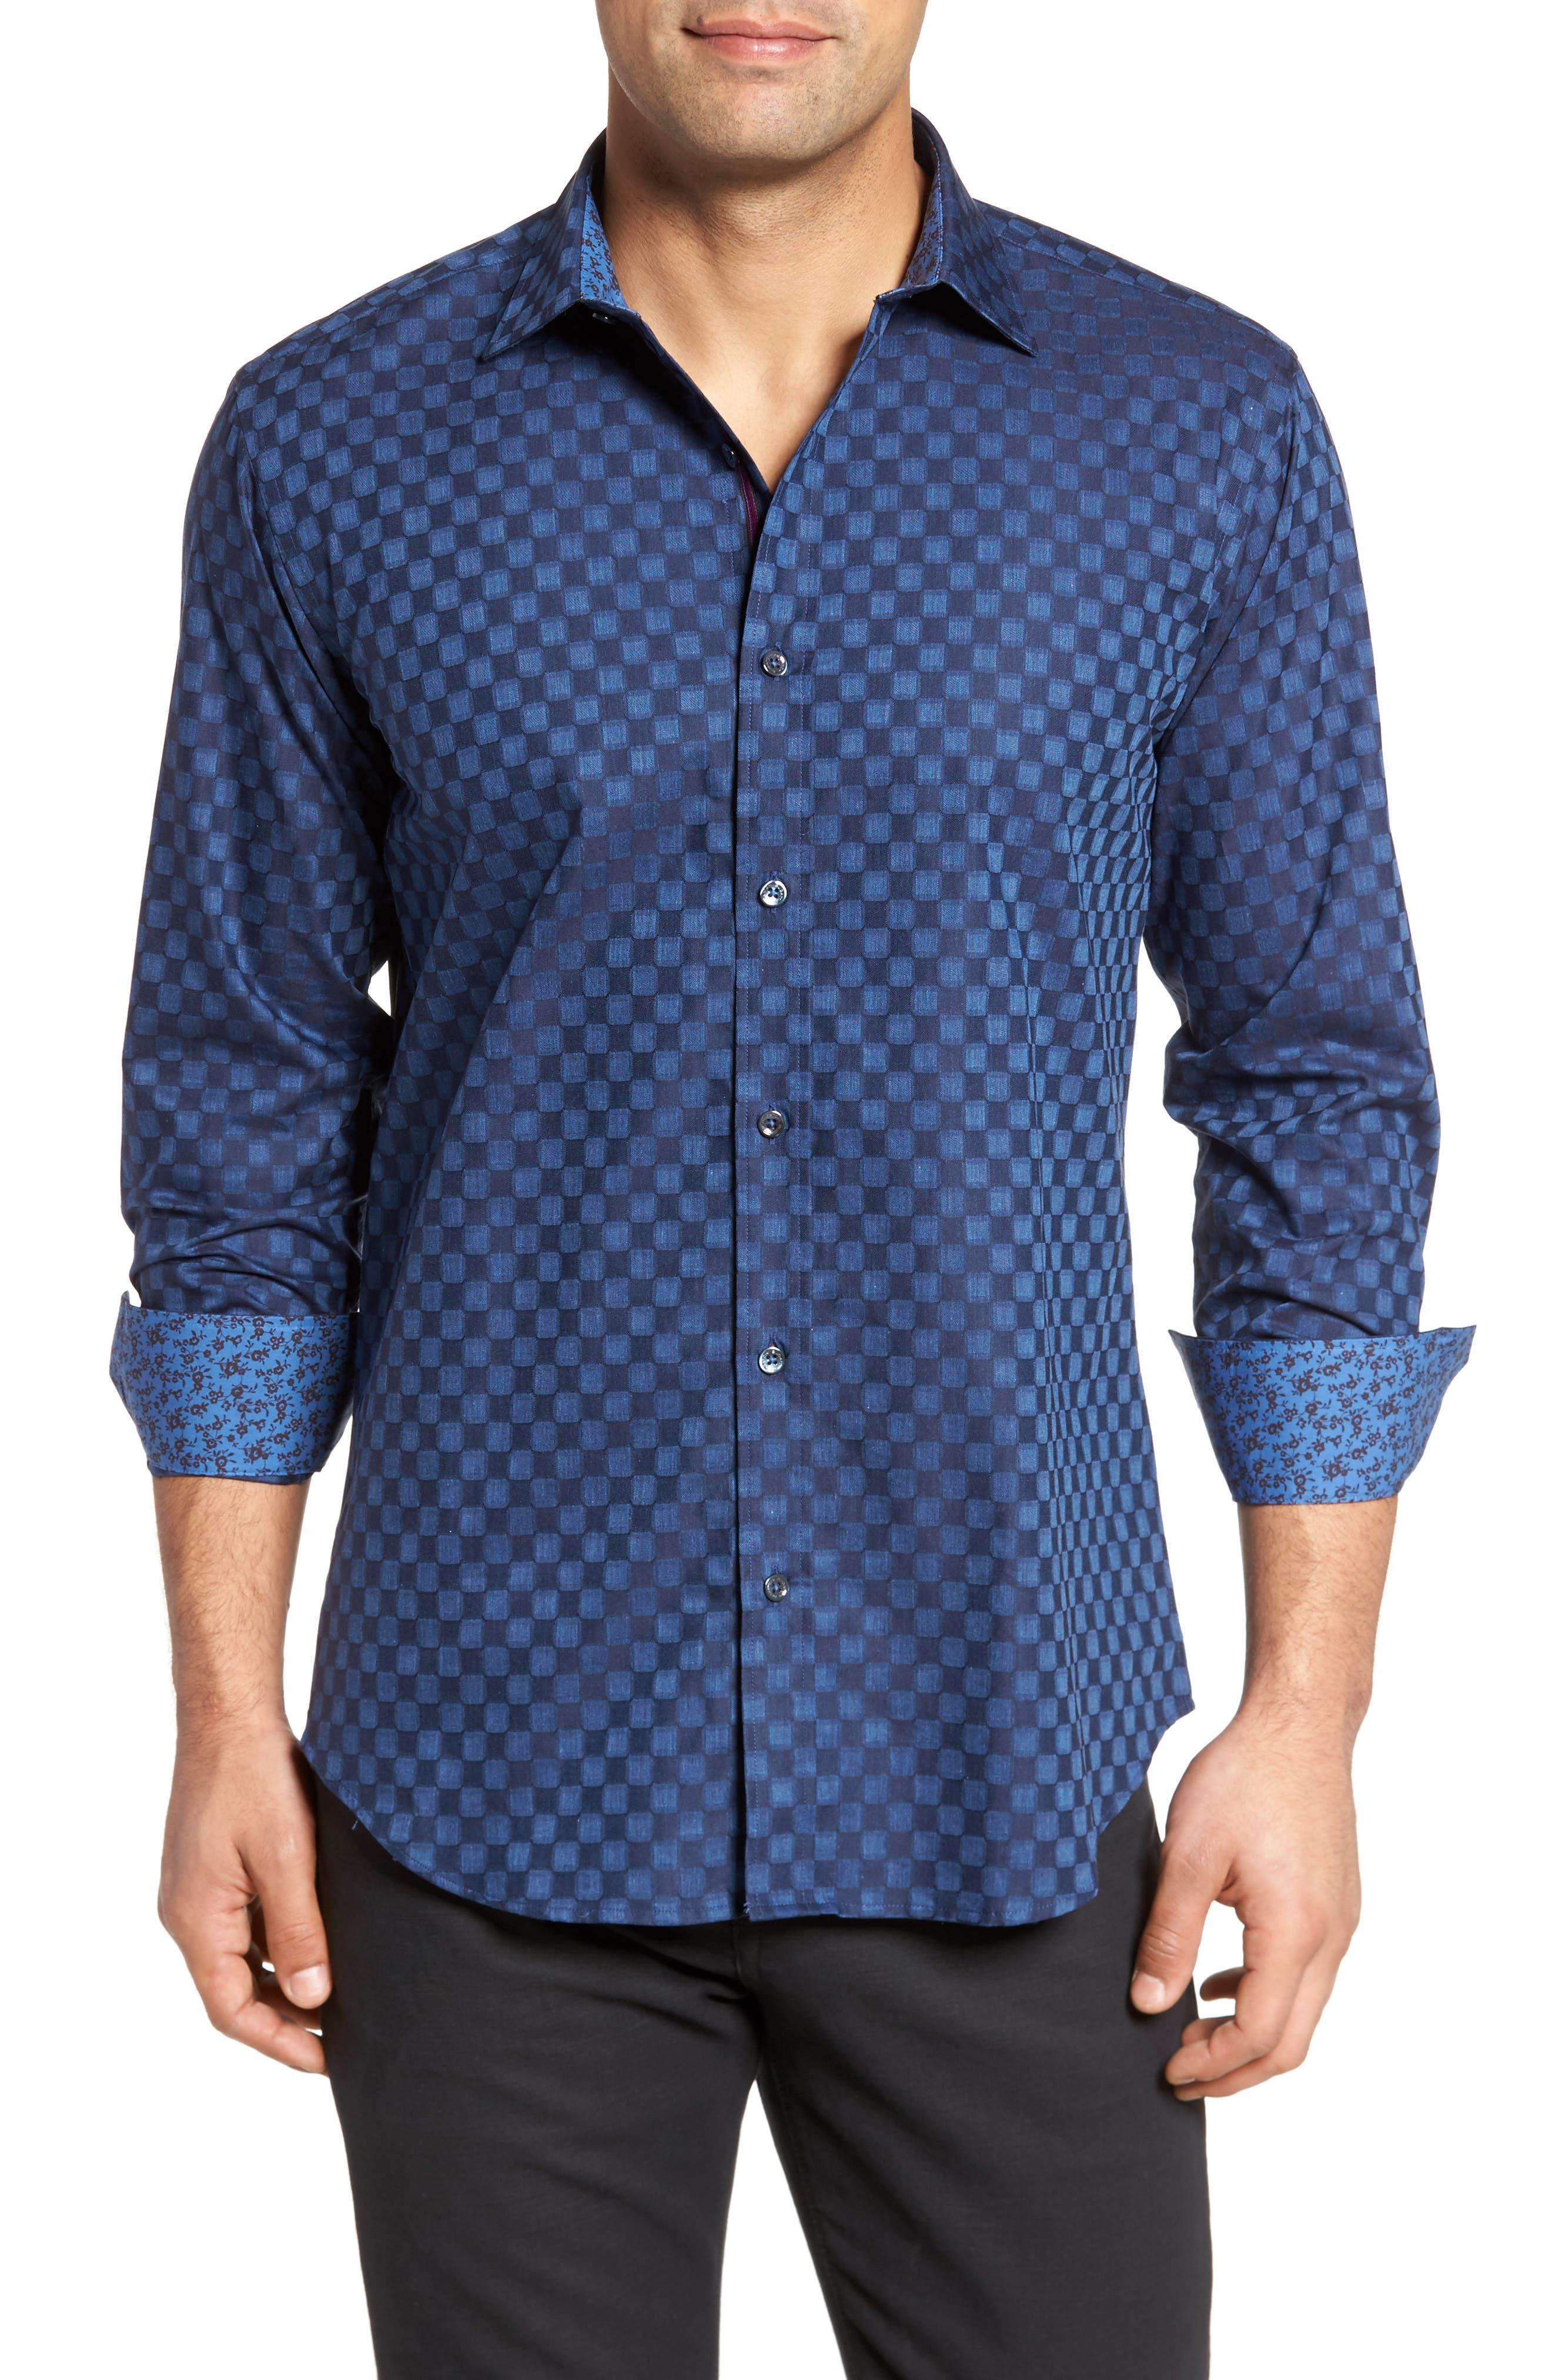 Alternate Image 1 Selected - Bugatchi Slim Fit Square Jacquard Sport Shirt